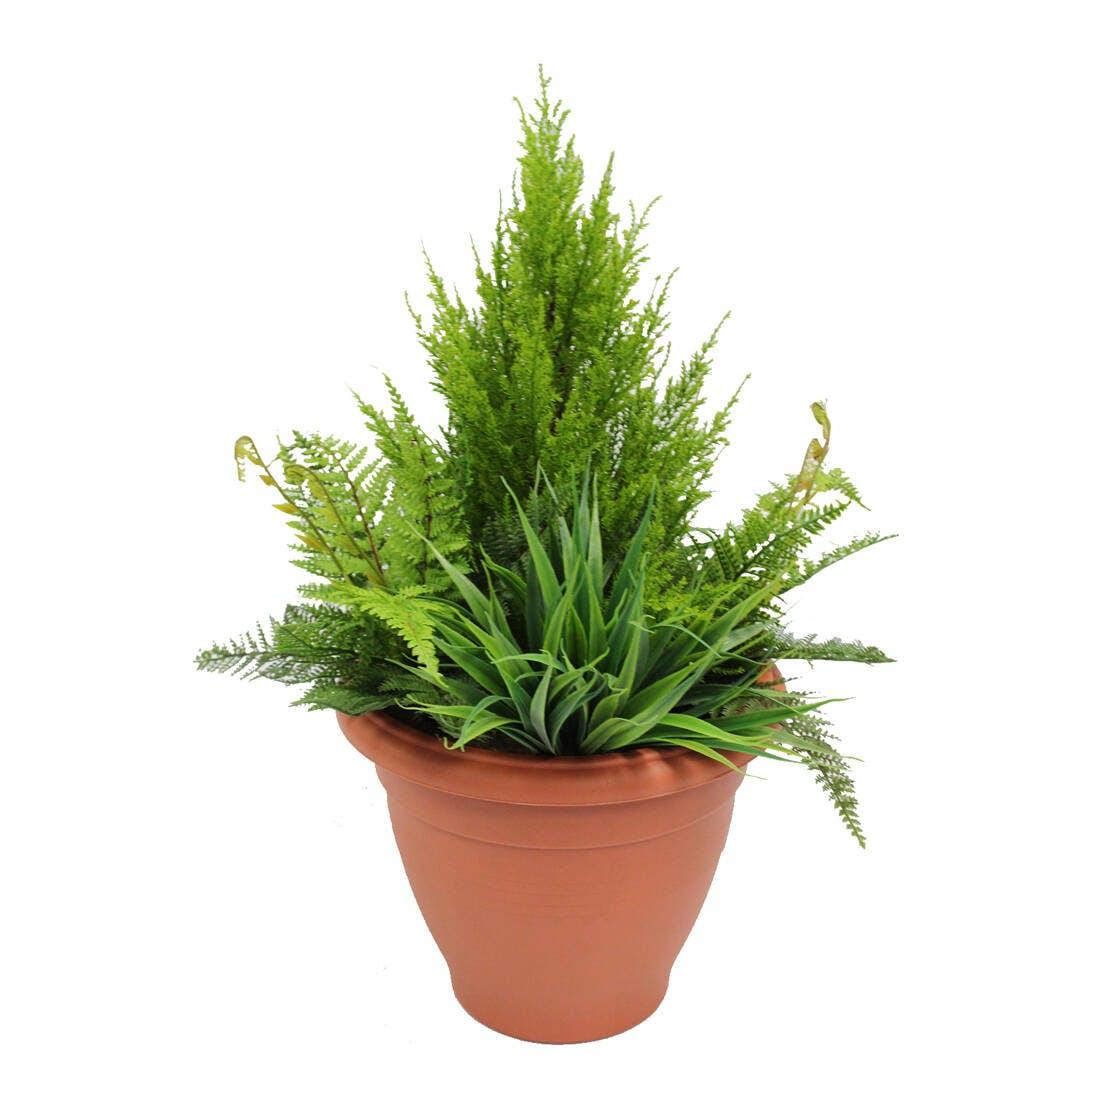 Artificial foliage patio planter